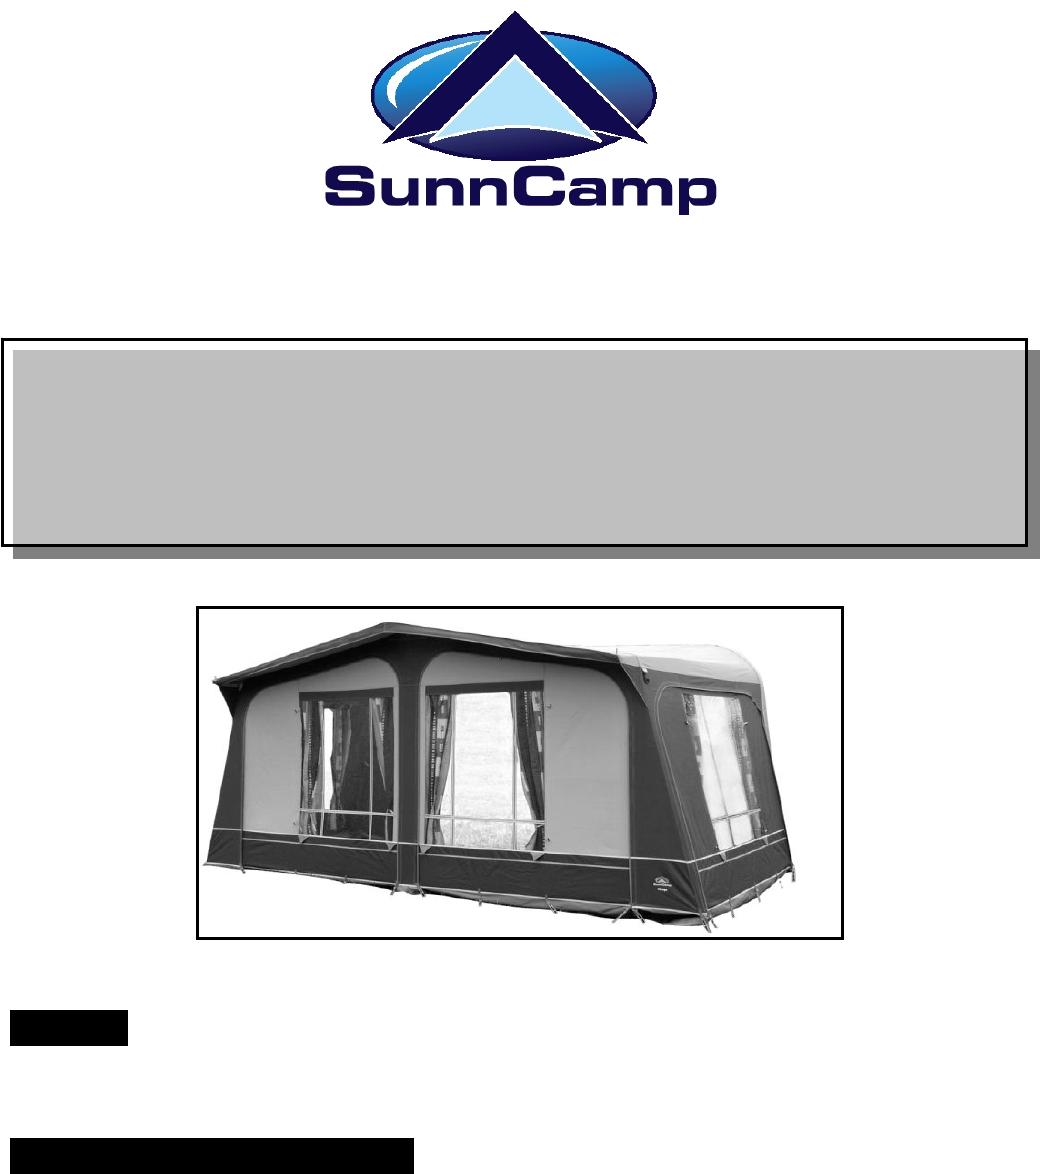 SunnCamp Mirage handleiding (9 pagina's)